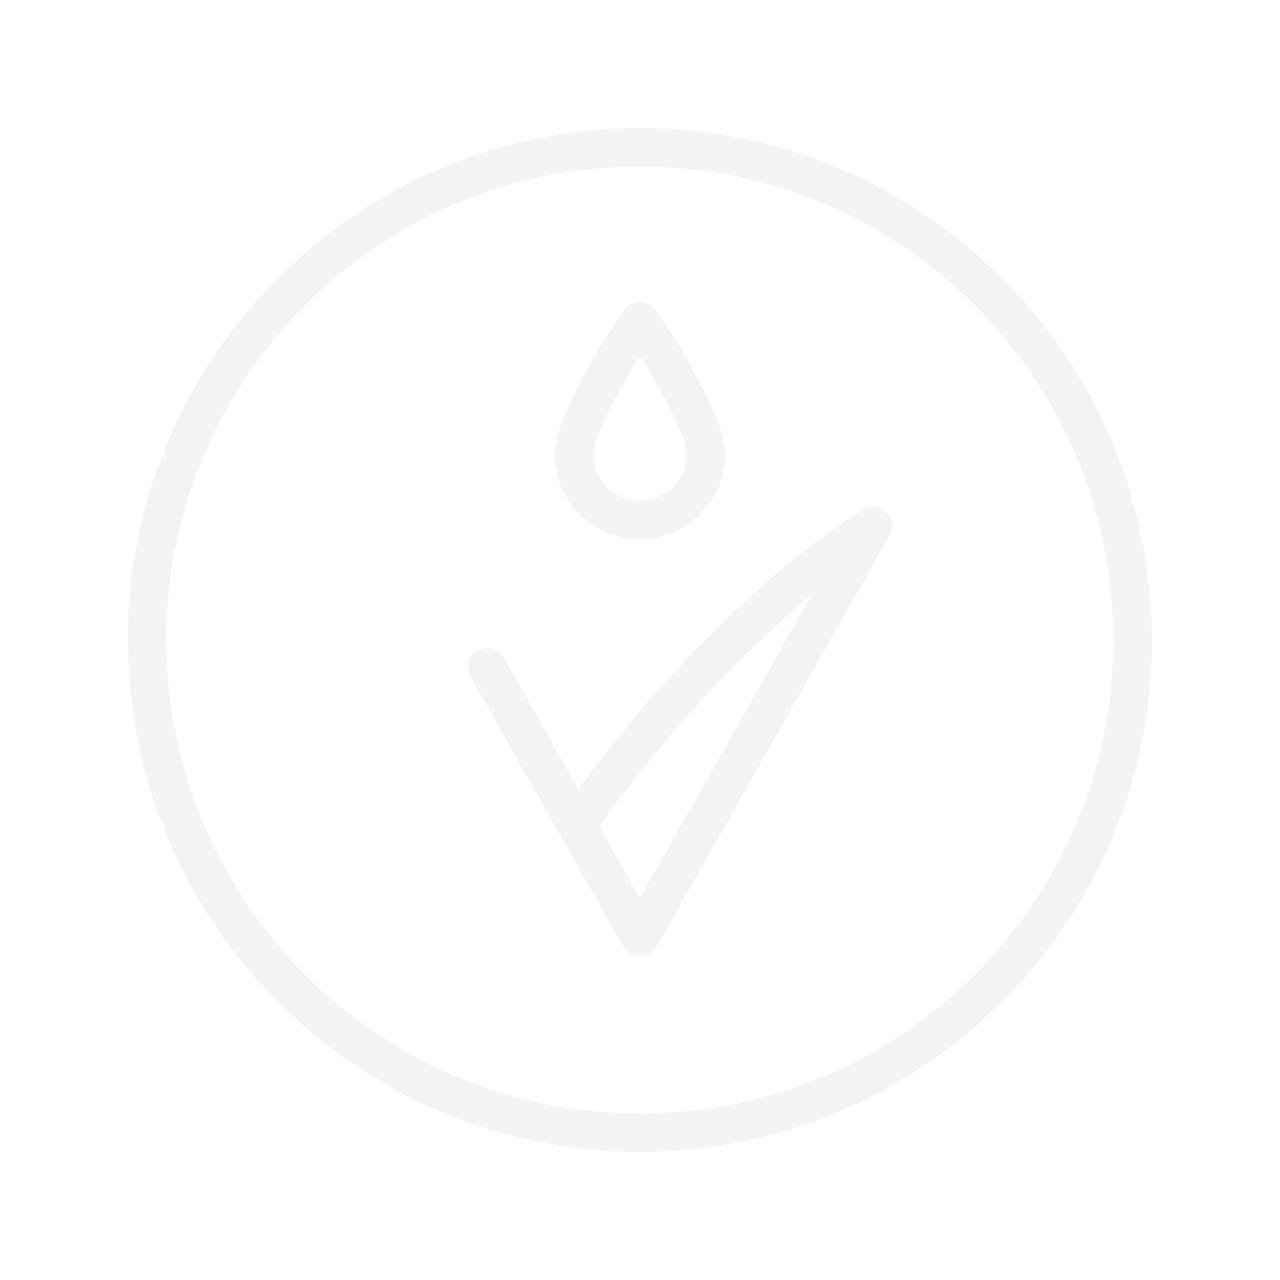 SAMPURE MINERALS Retractable Eyeliner Soft Cream